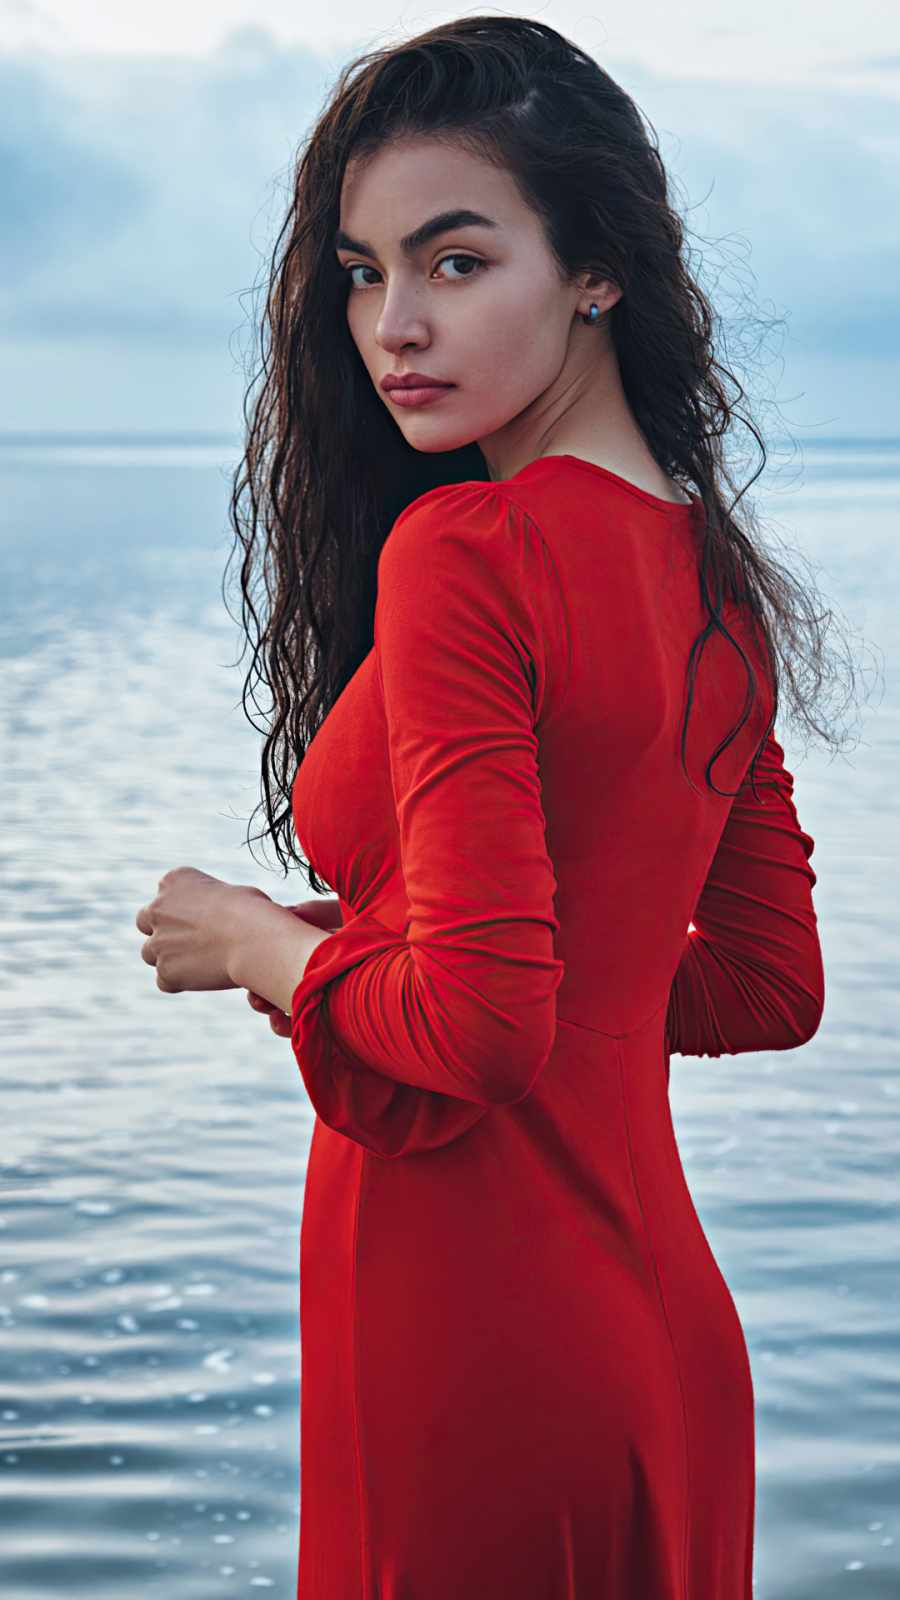 Red dress girl Long hair looking back